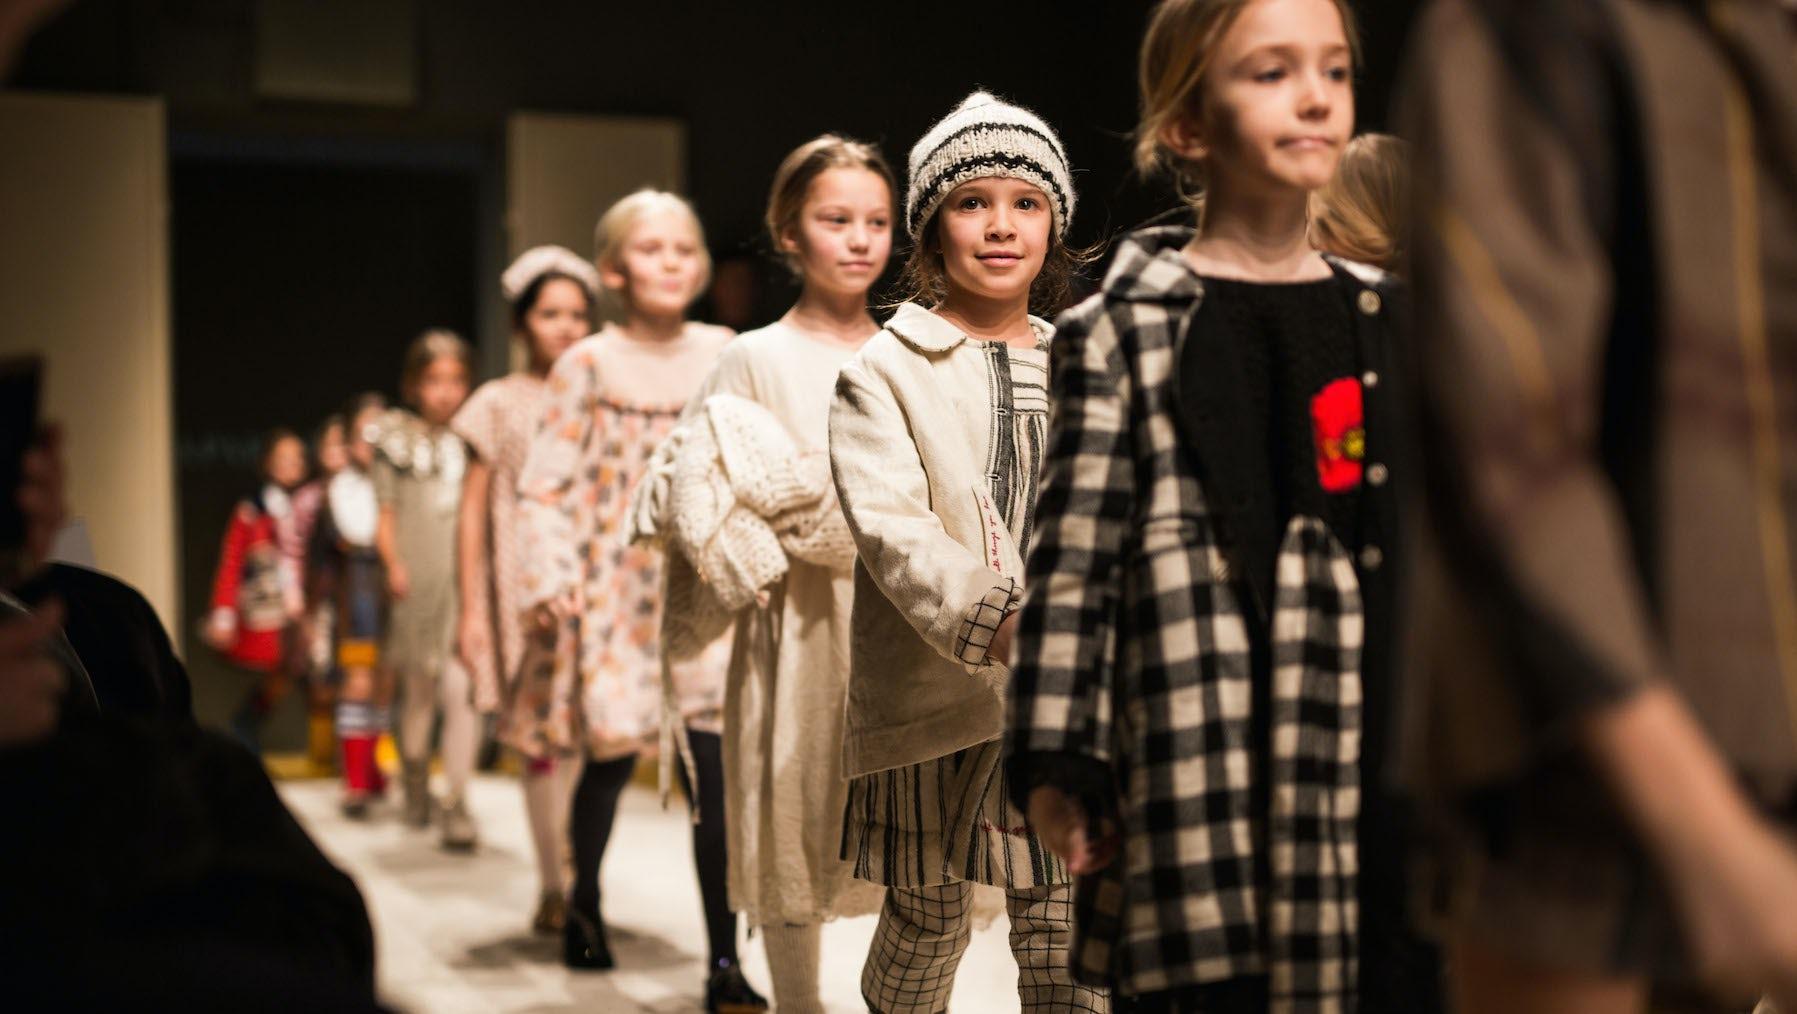 The Childrenswear Market Comes of Age